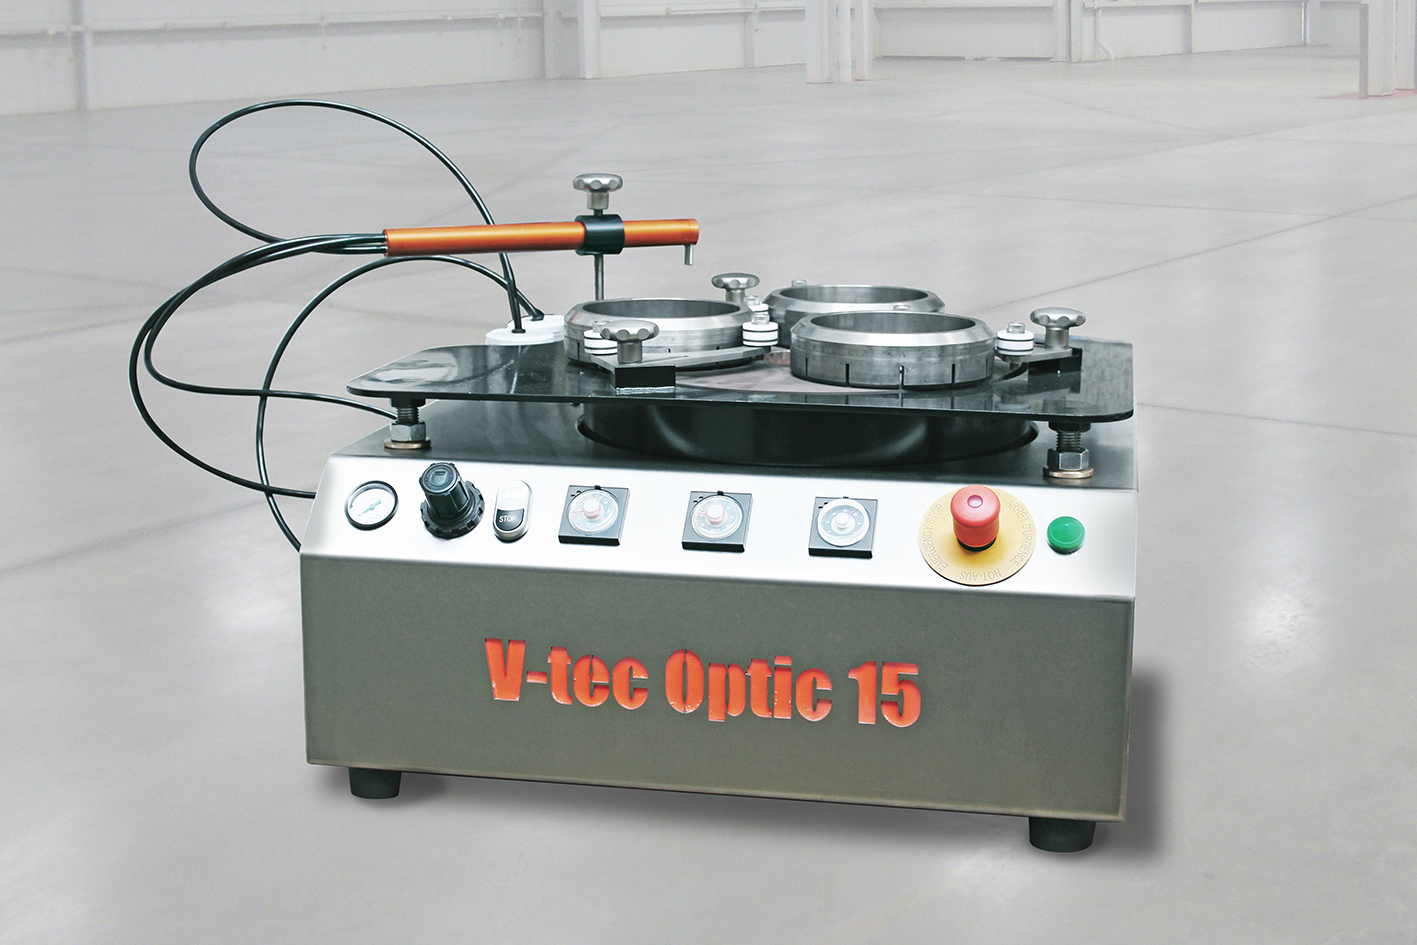 OPTIC 15